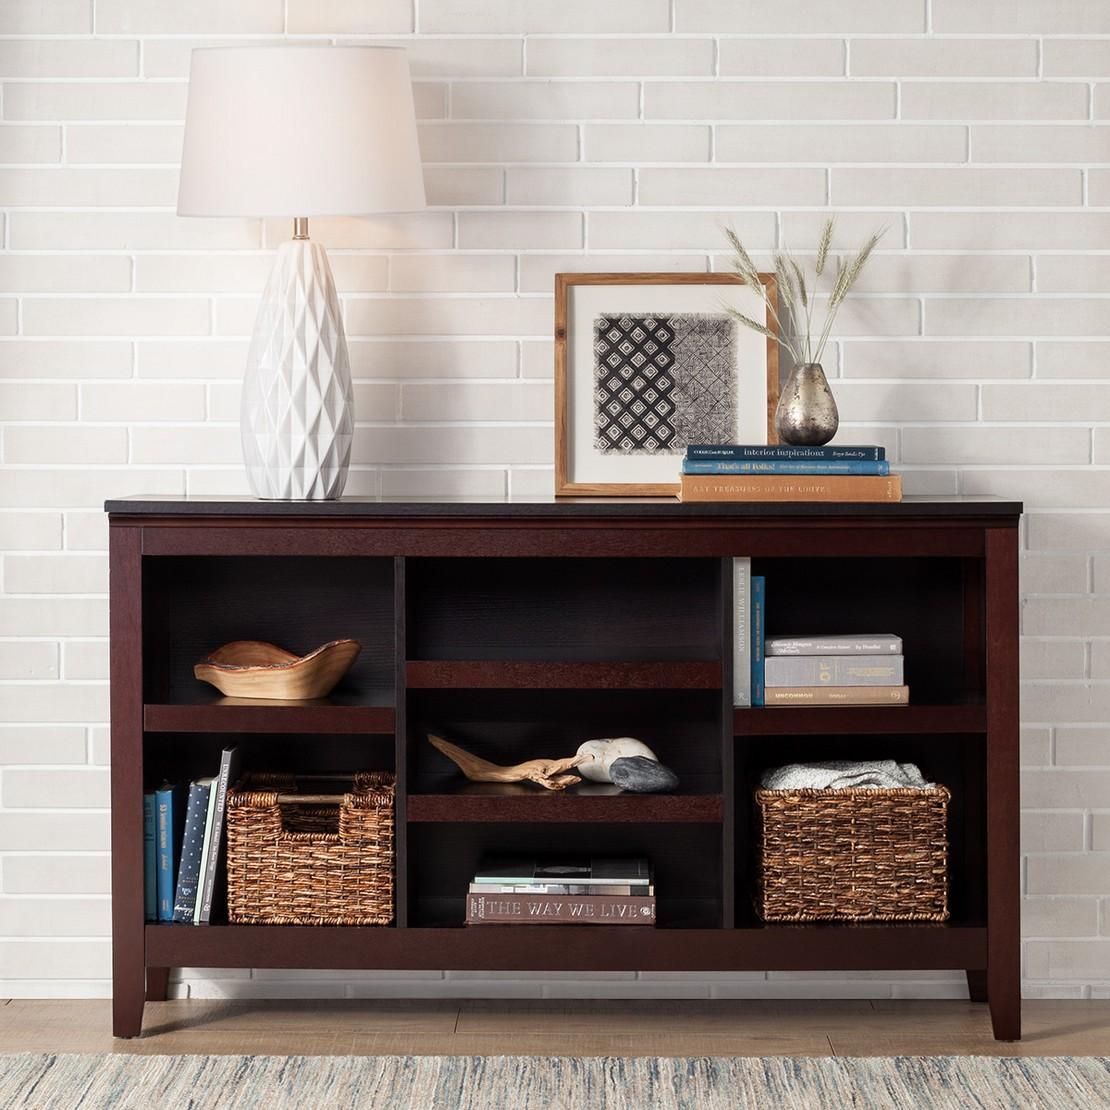 Home Office Furniture: Home Office Furniture : Target